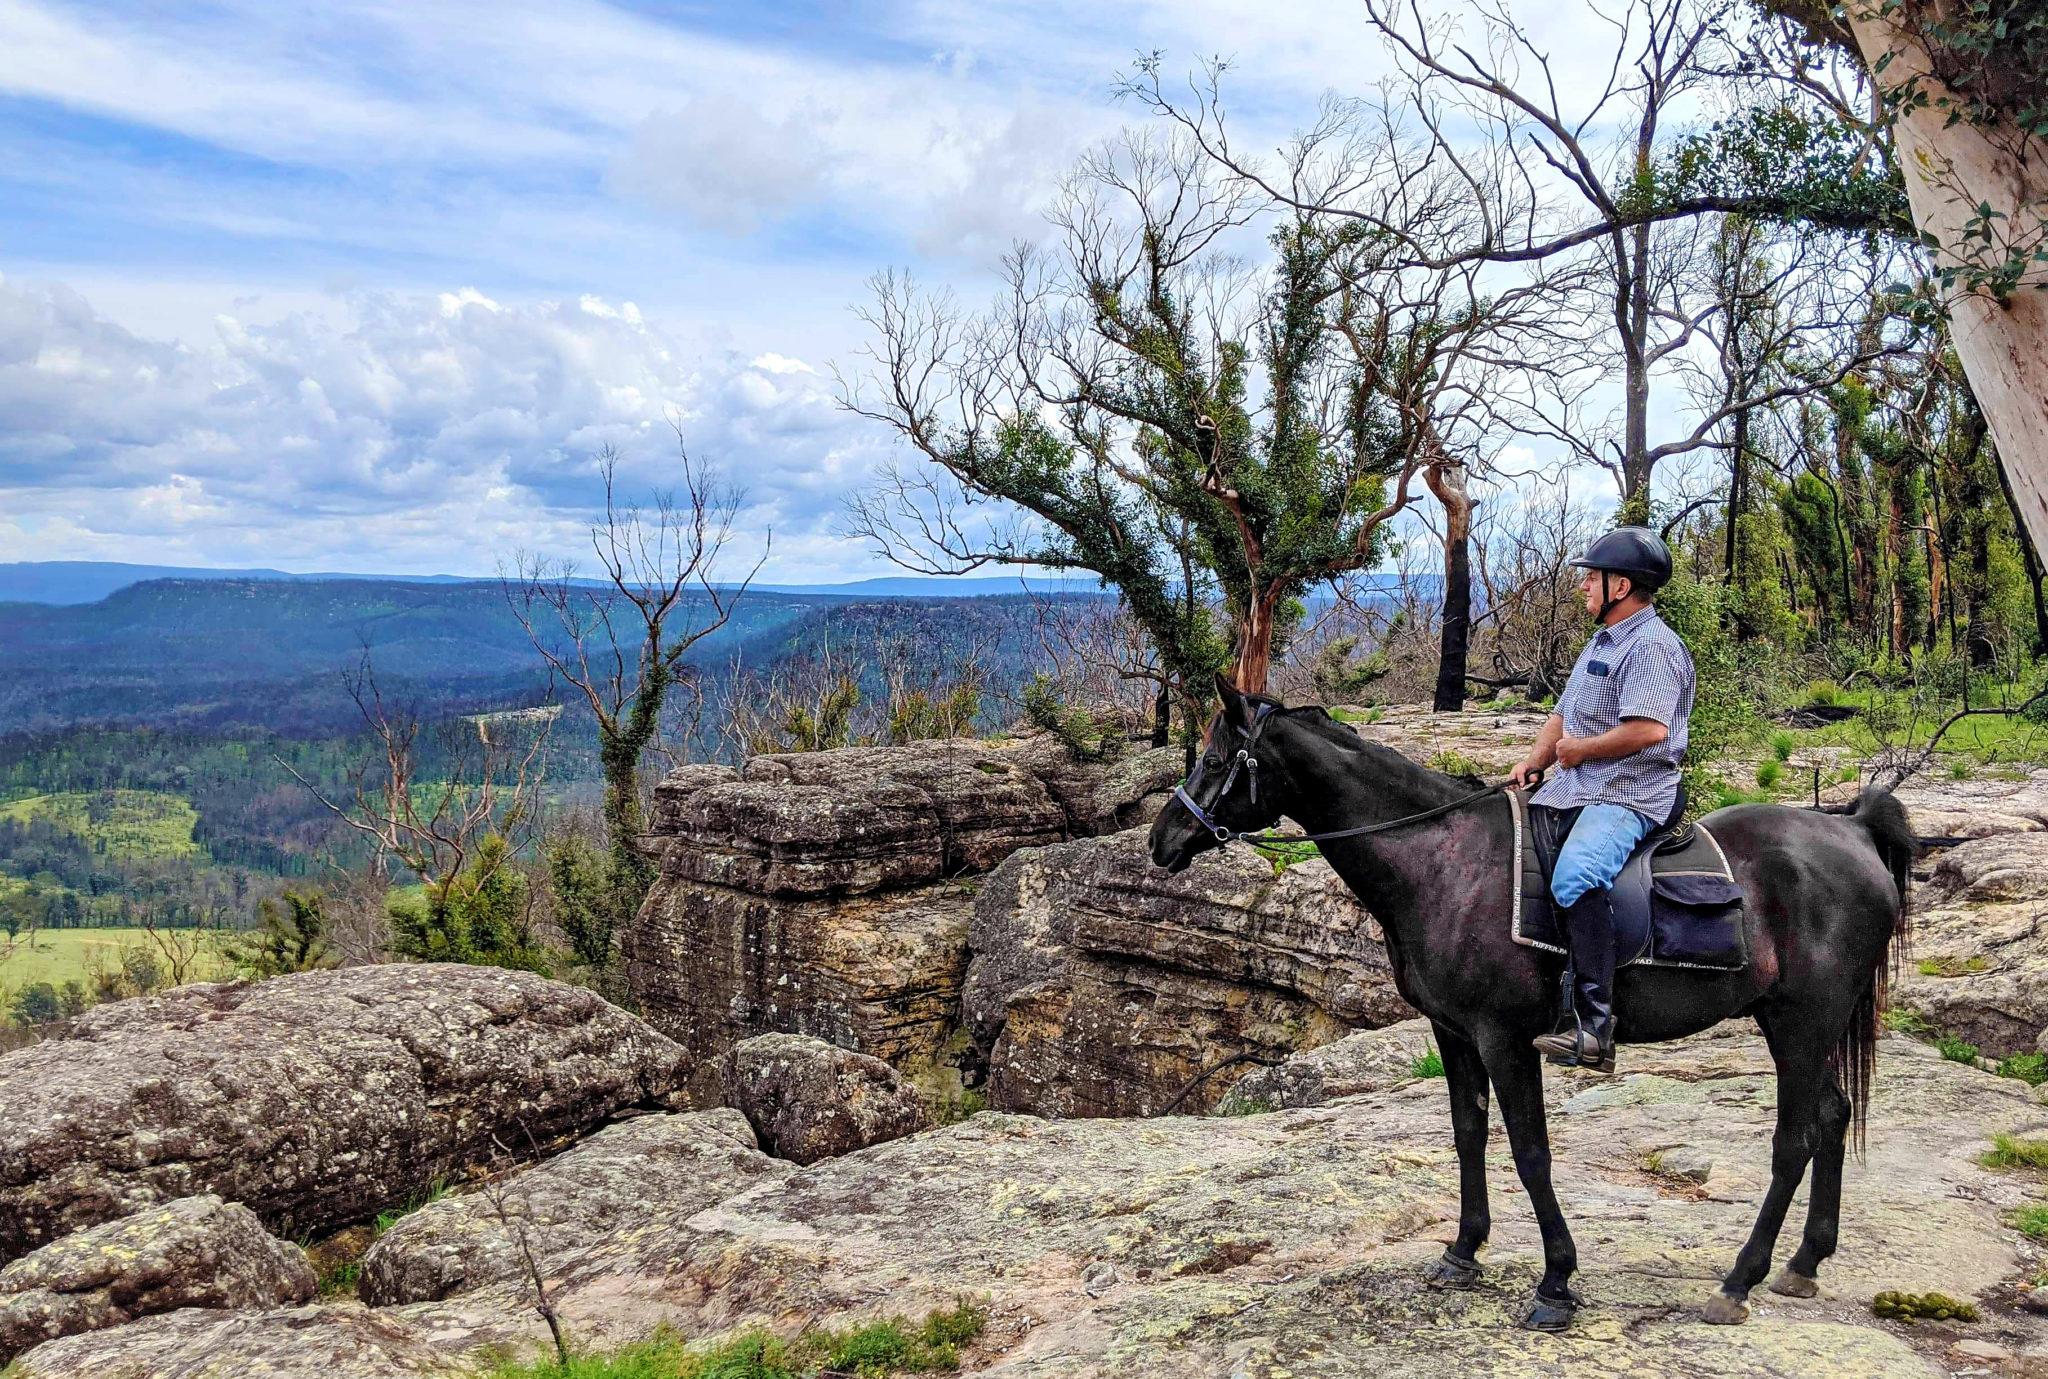 Meet a Globetrotter: Anthony Tietze - The Shoalhaven Ride, Australia - Globetrotting horse riding holidays